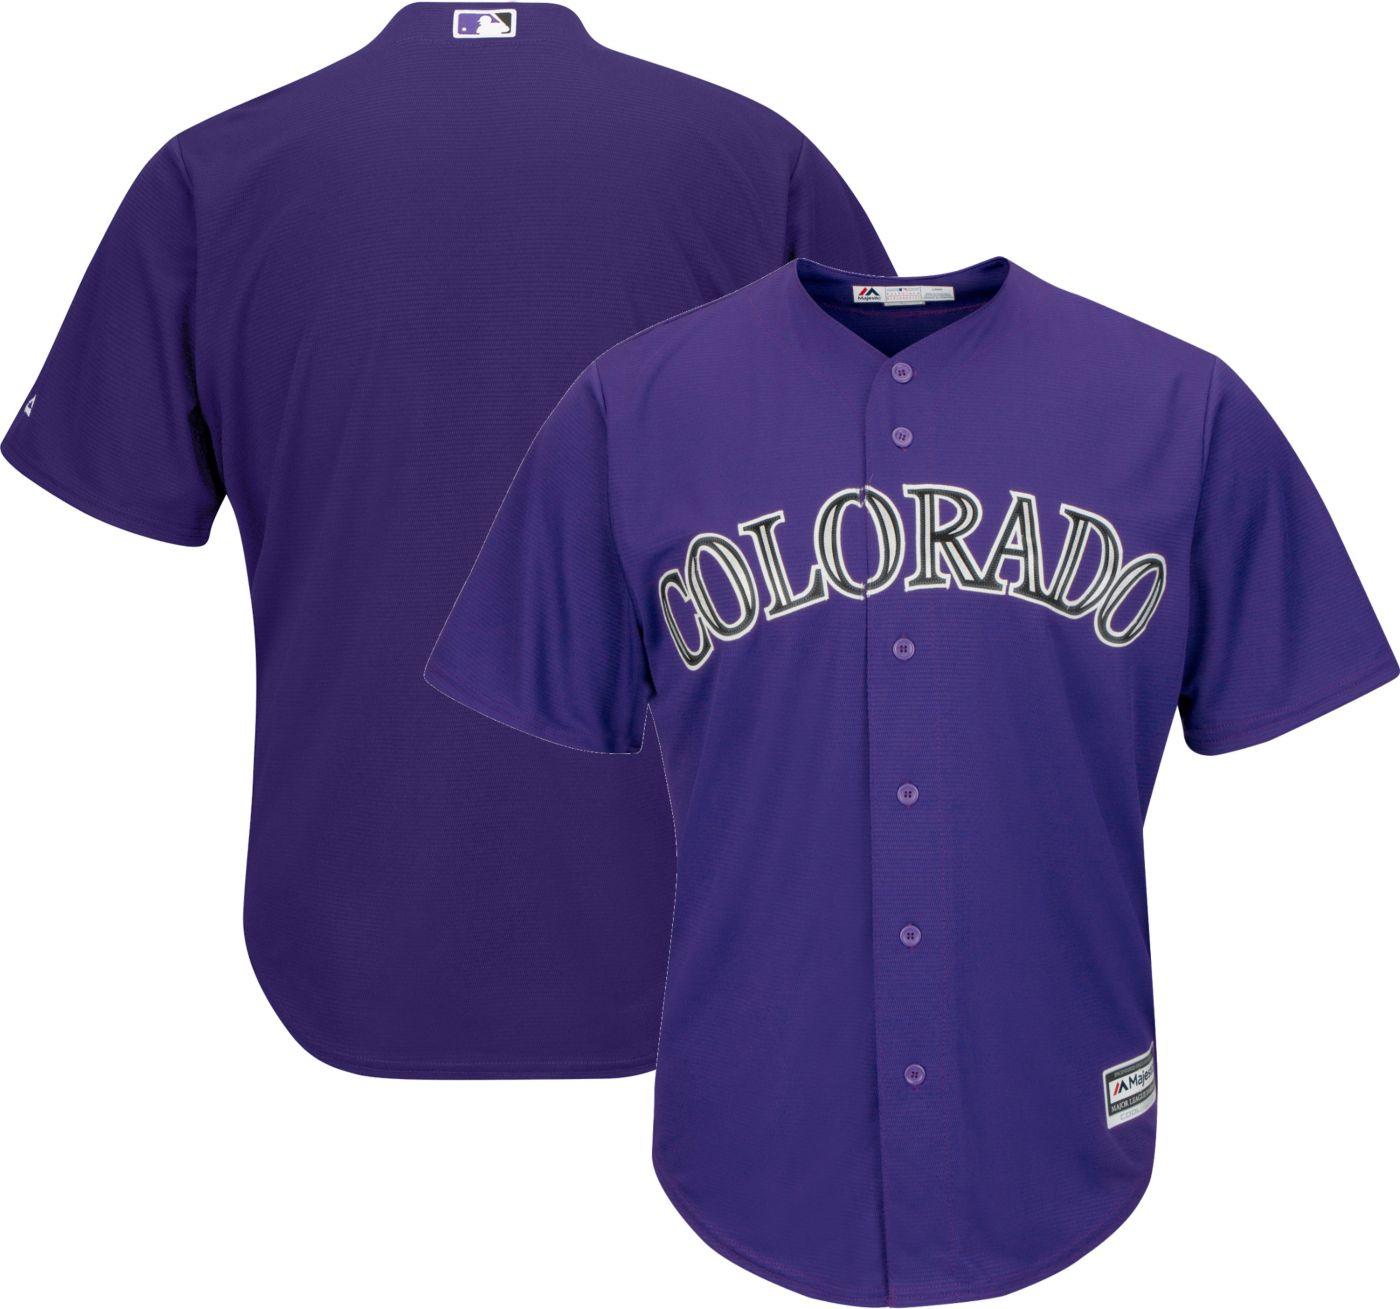 Majestic Men's Replica Colorado Rockies Cool Base Alternate Purple Jersey